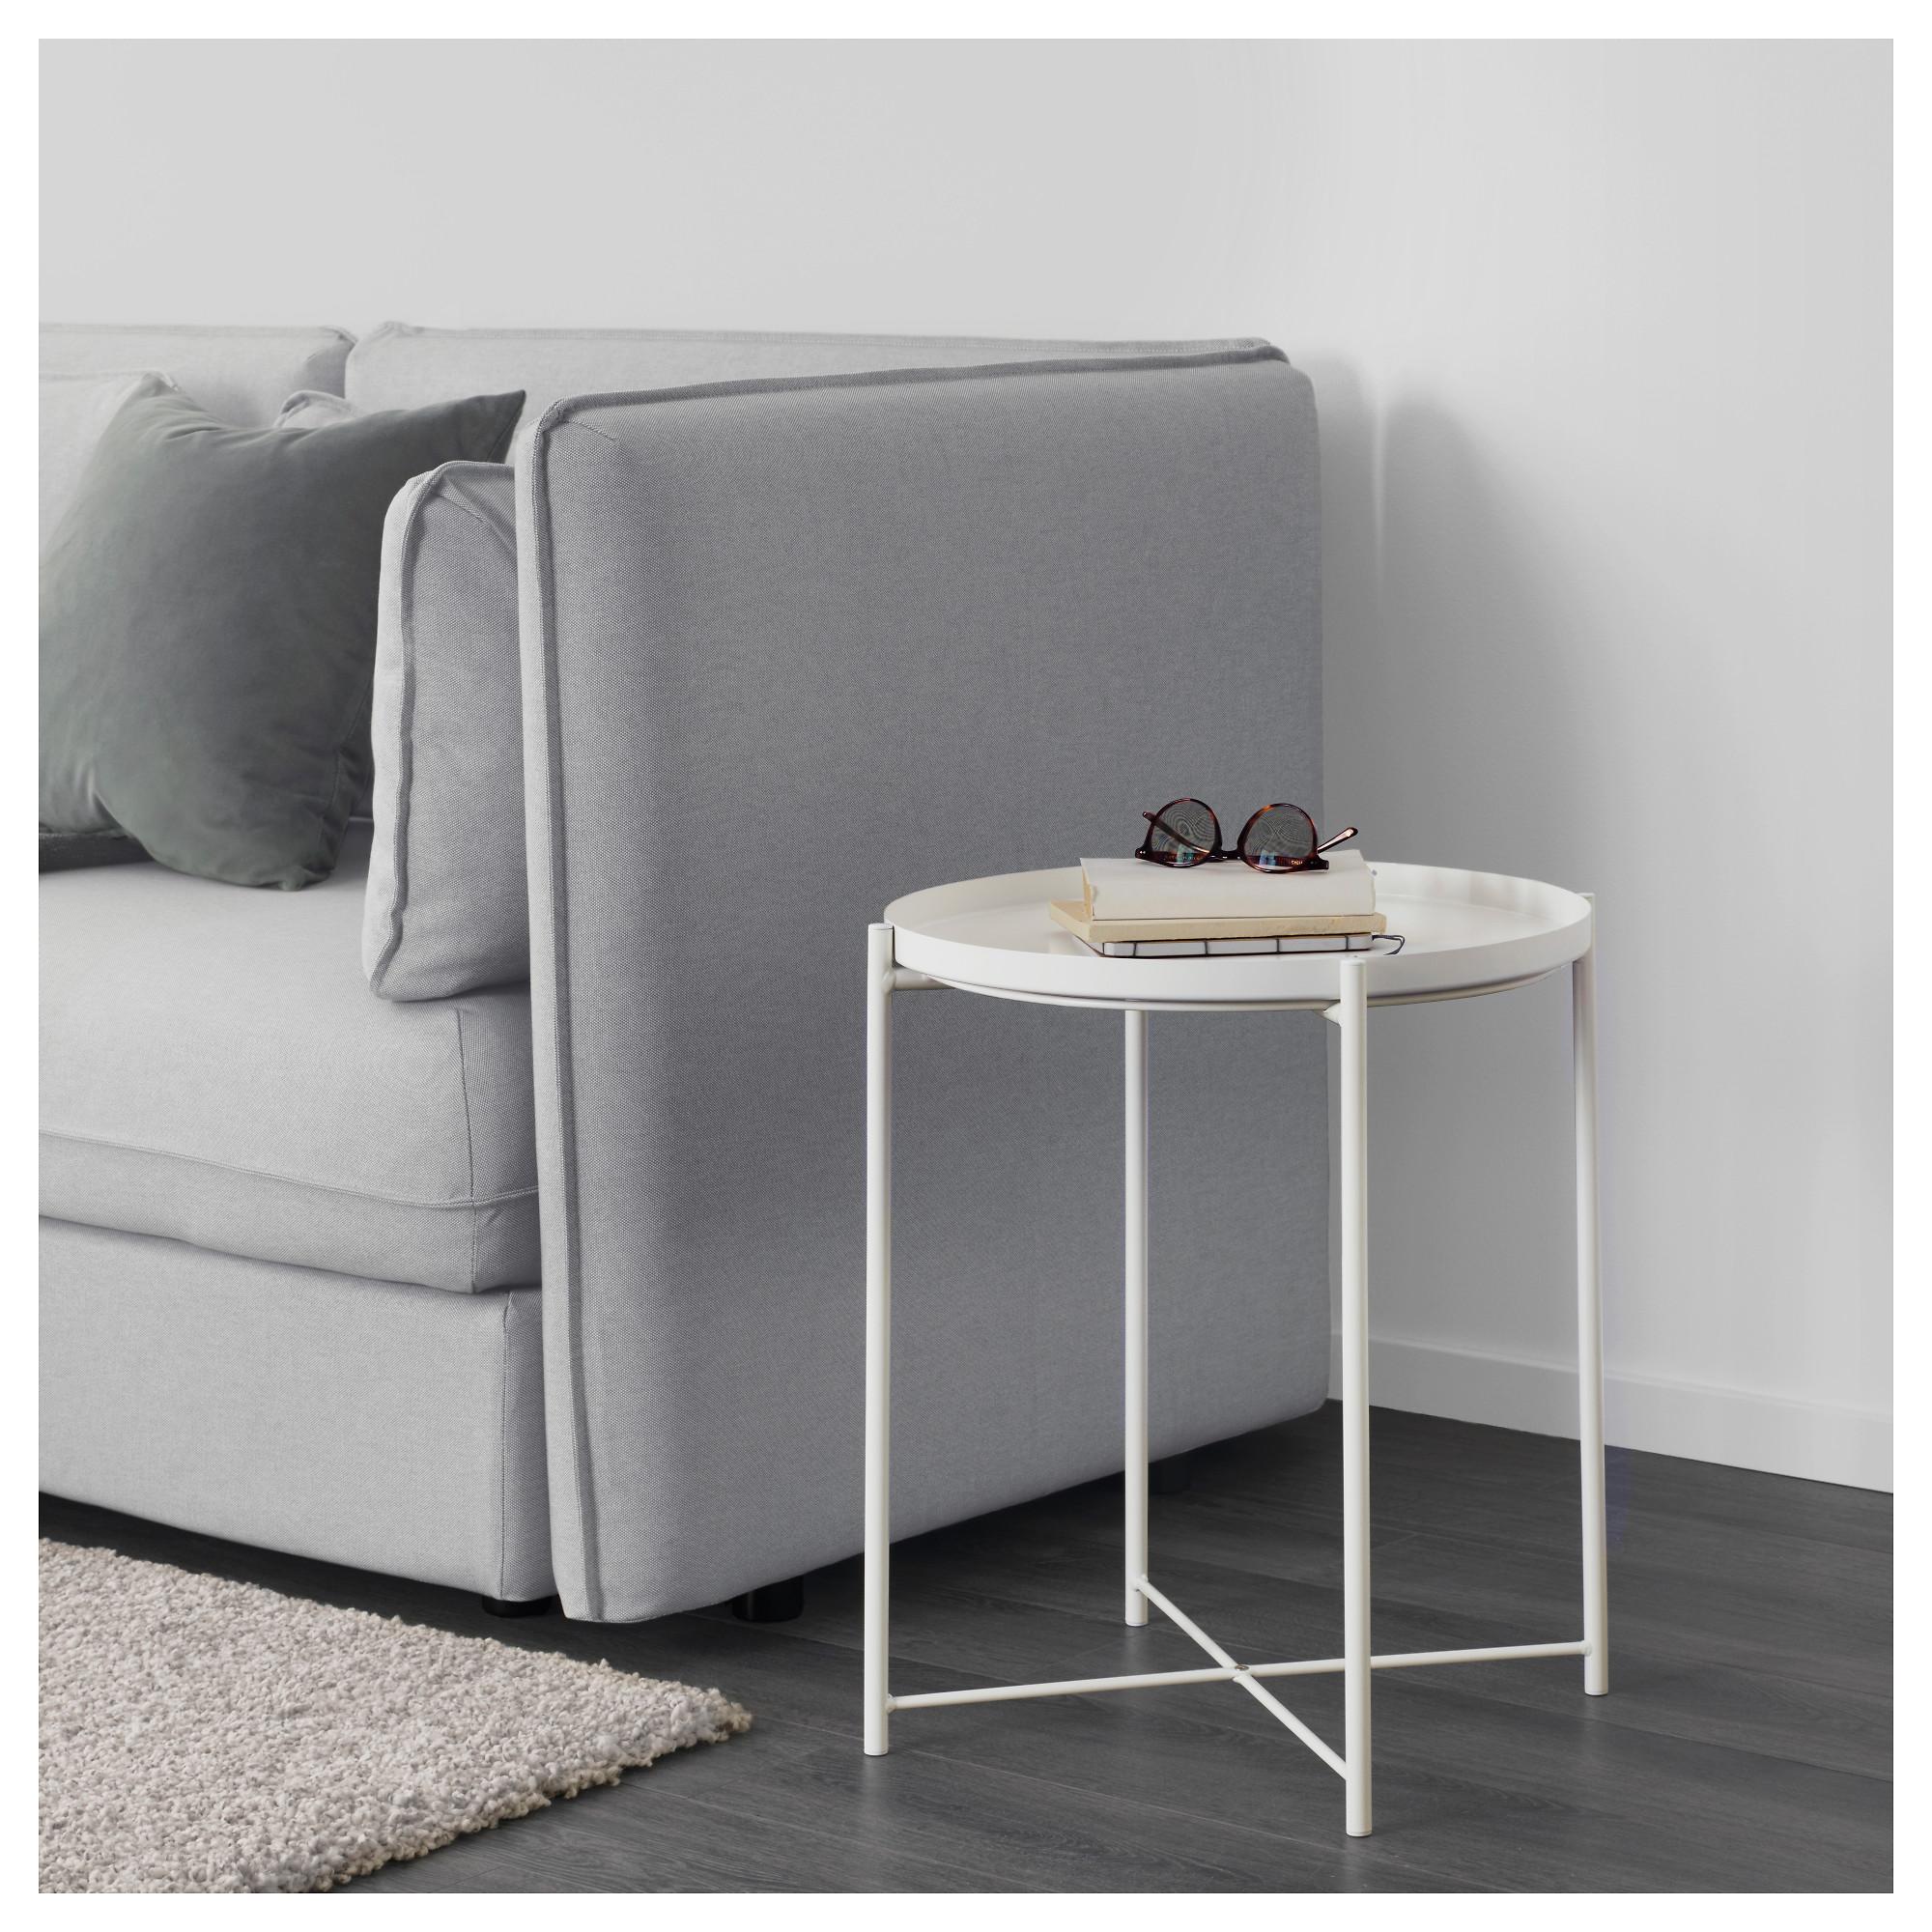 - GLADOM - Tray Table, White IKEA Hong Kong